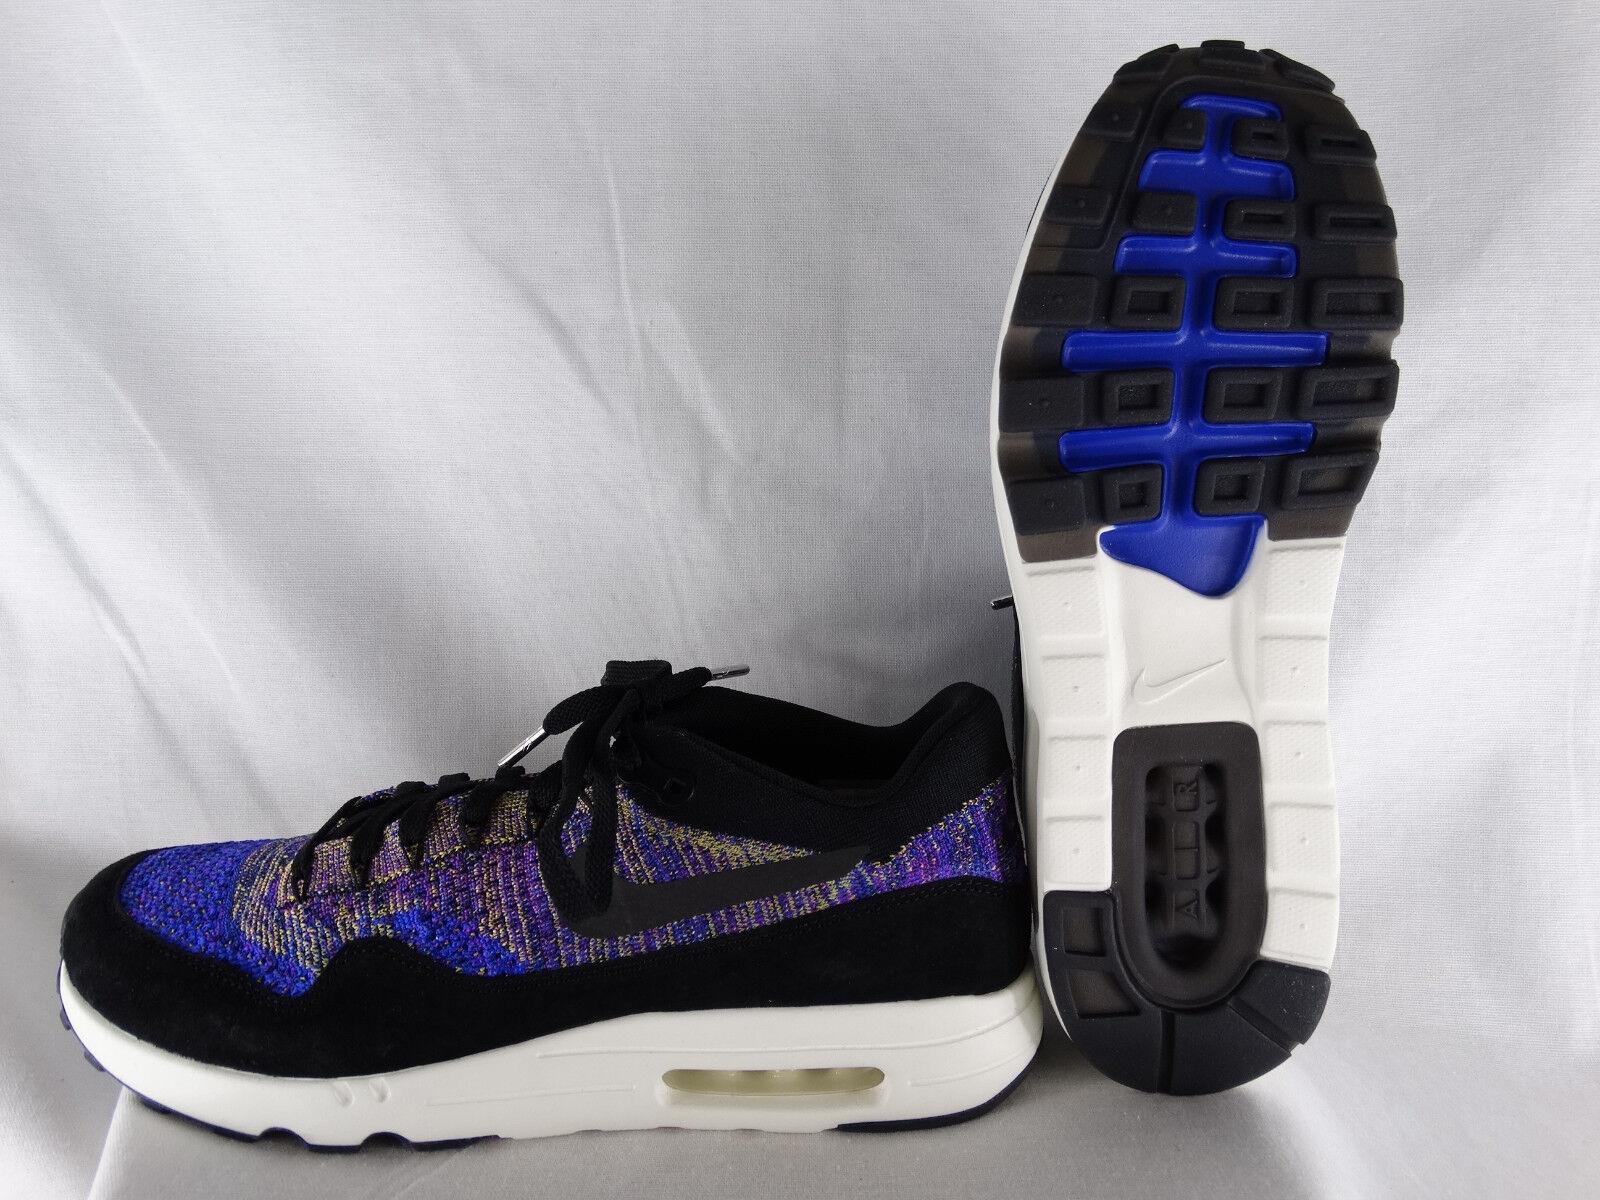 NikeLab Air Max 1 Flyknit Sneaker blau-schwarz-lila EU 43 US 9,5